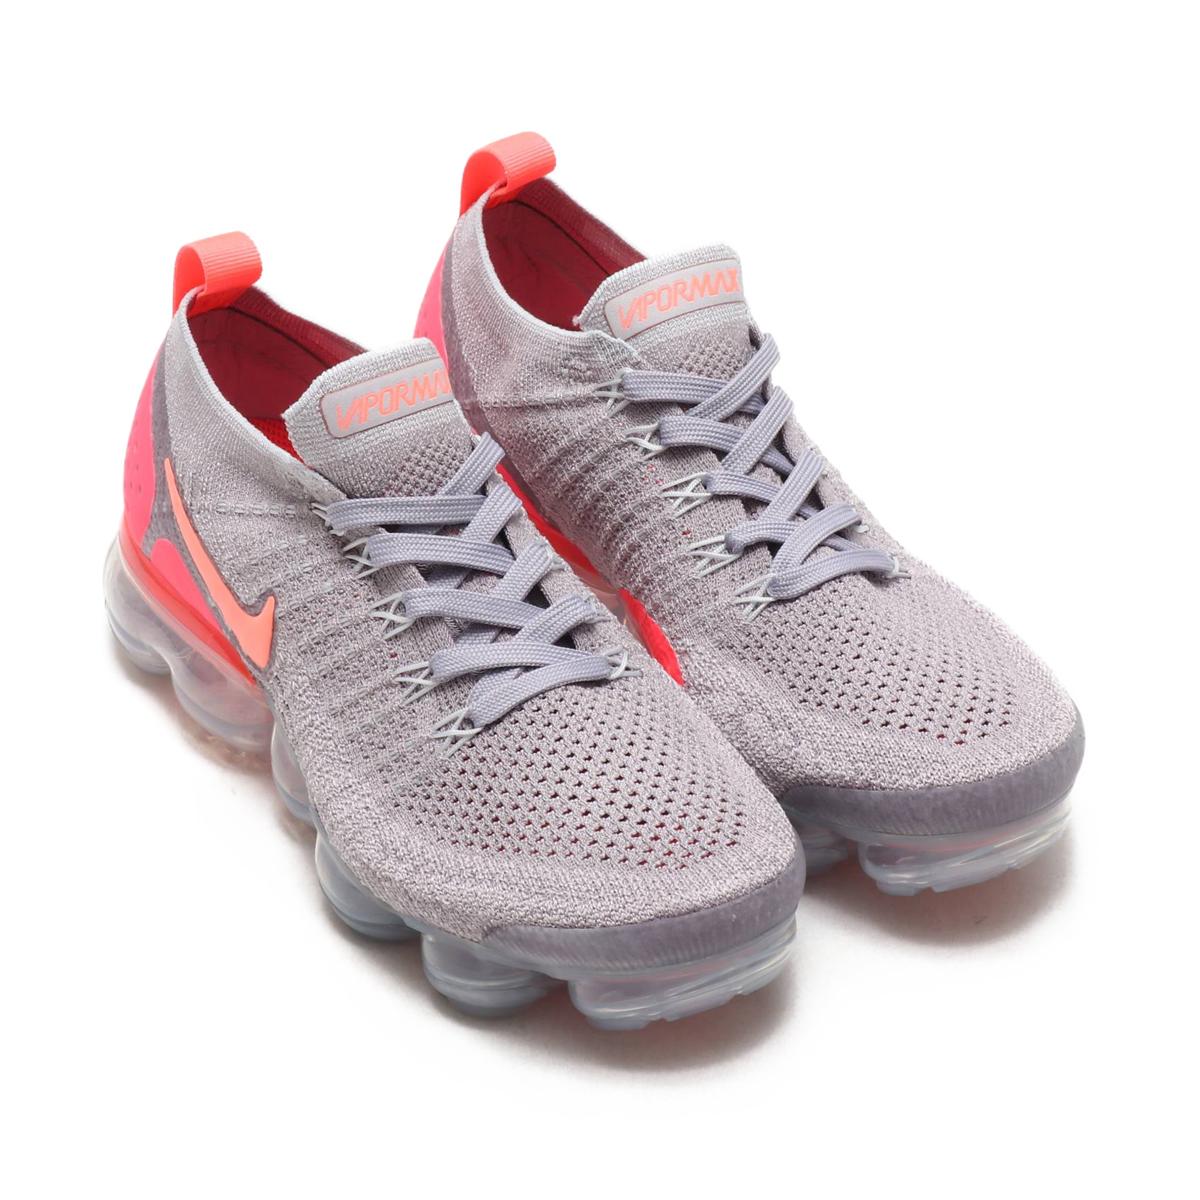 2539876ebfd NIKE W AIR VAPORMAX FLYKNIT 2 (Nike women air vapor max fried food knit 2)  (ATMOSPHERE GREY CRIMSON PULSE)